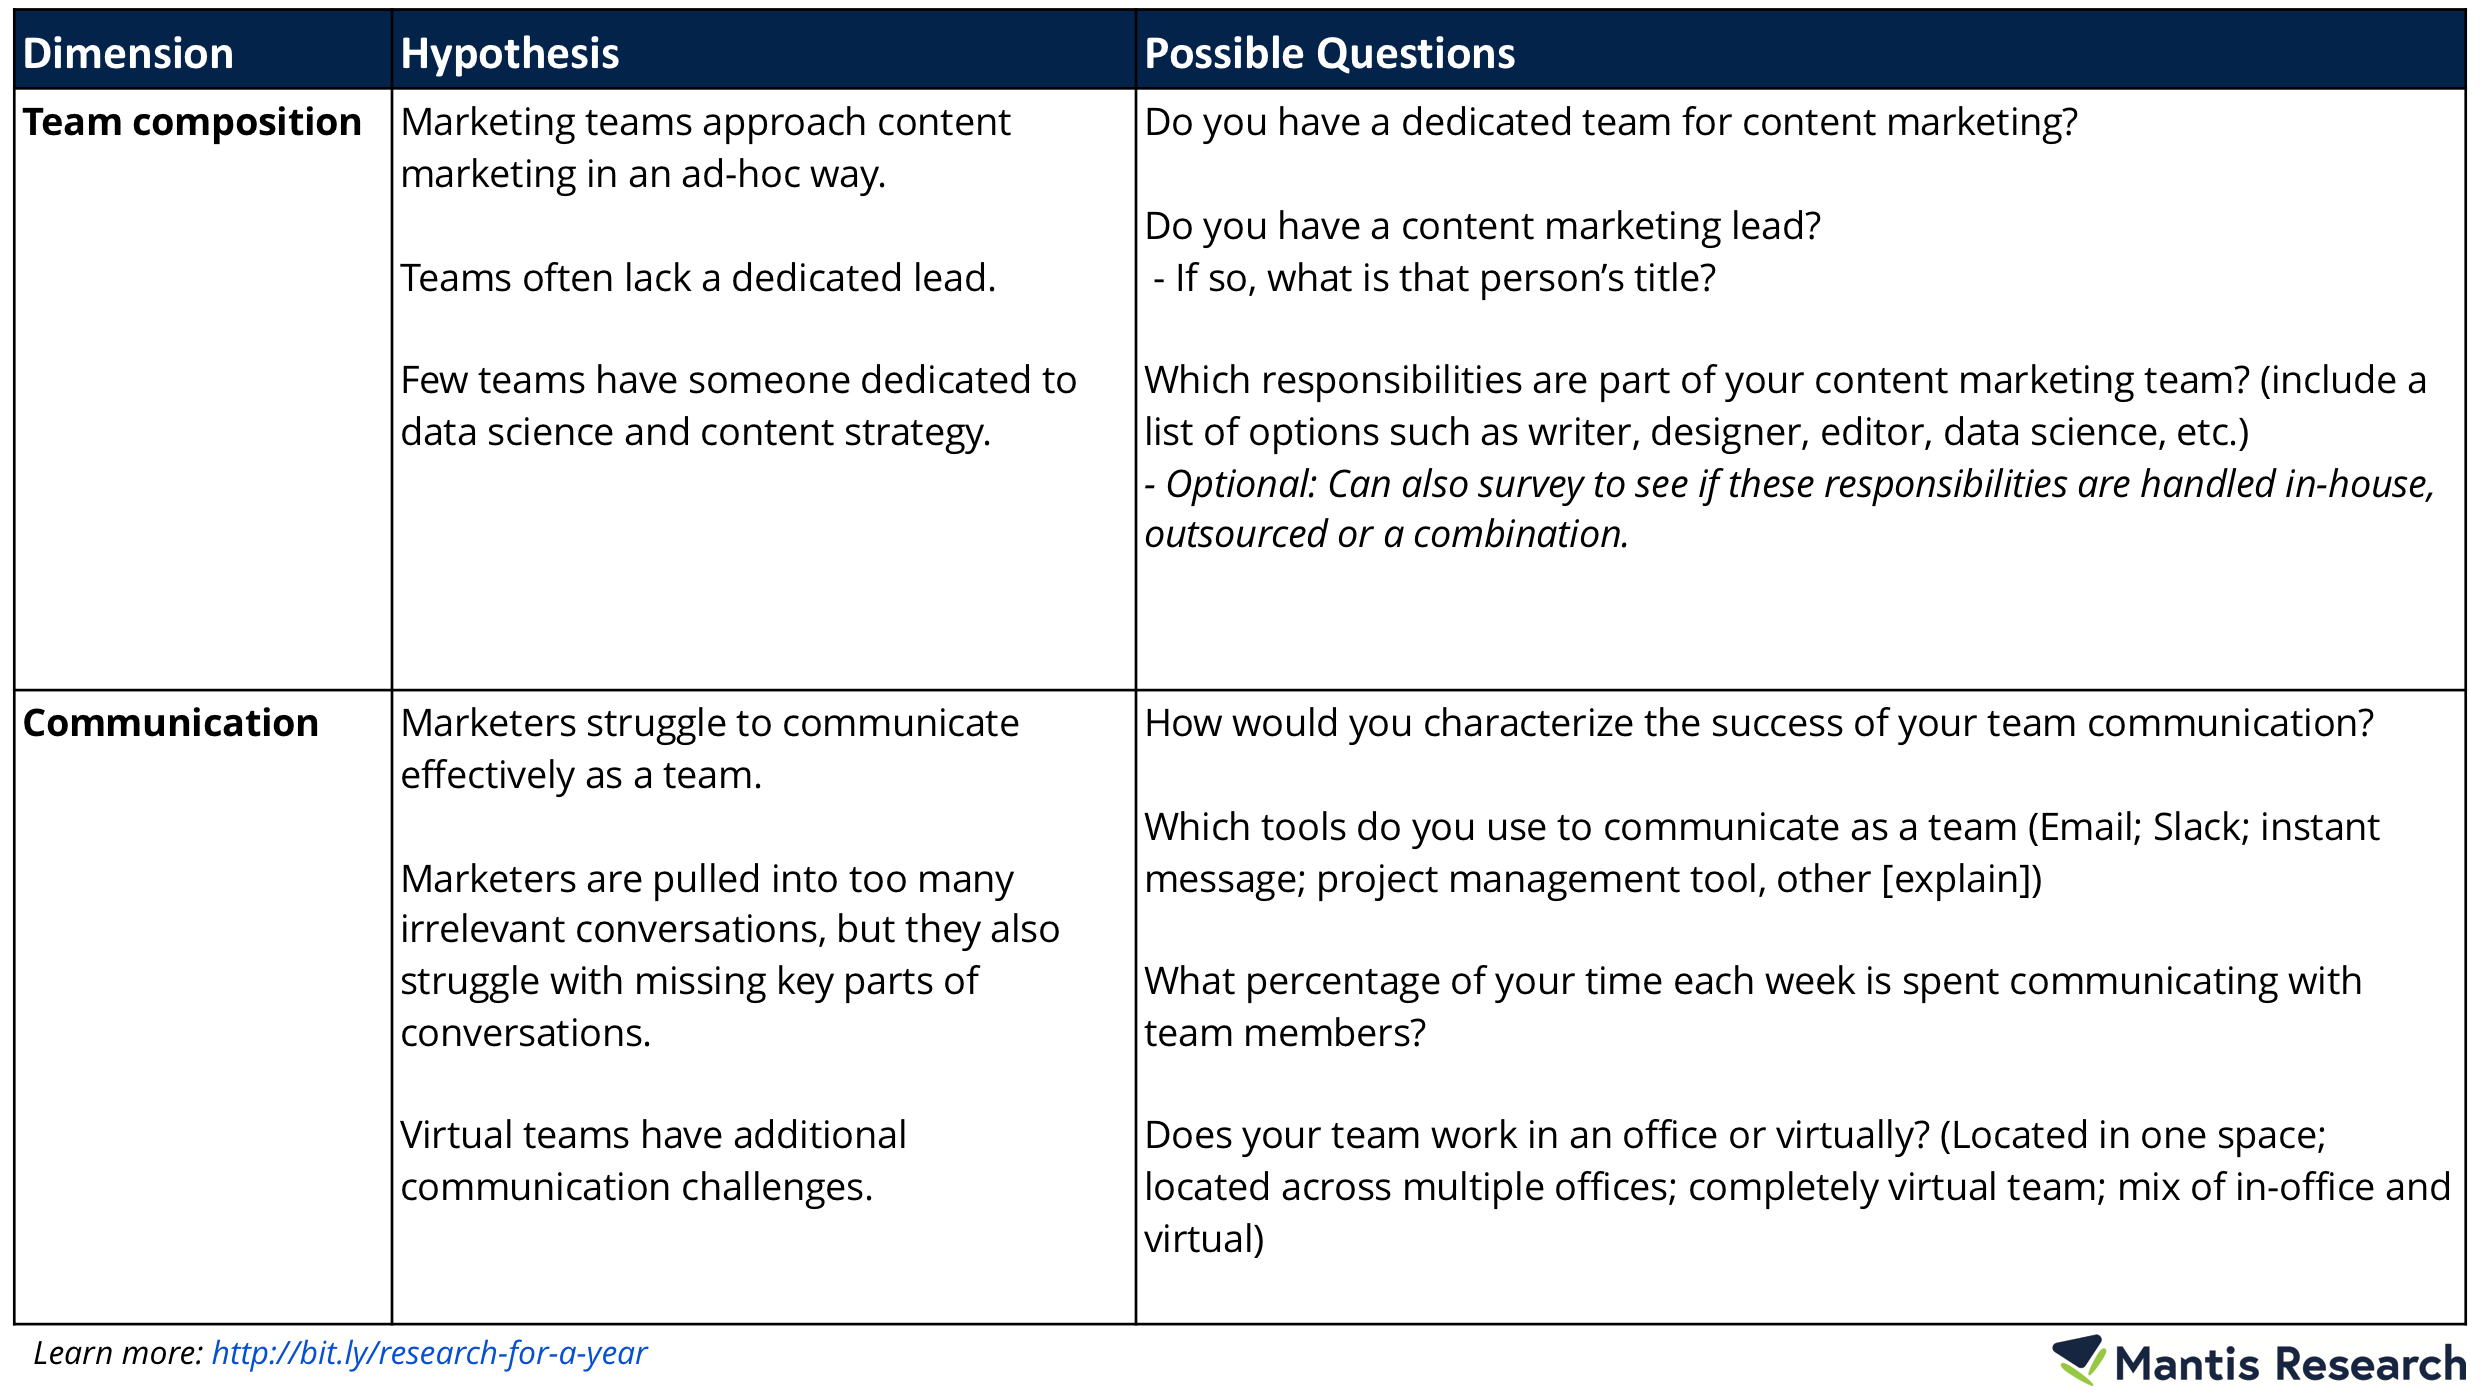 Dimension-Hypothesis-Questions-1